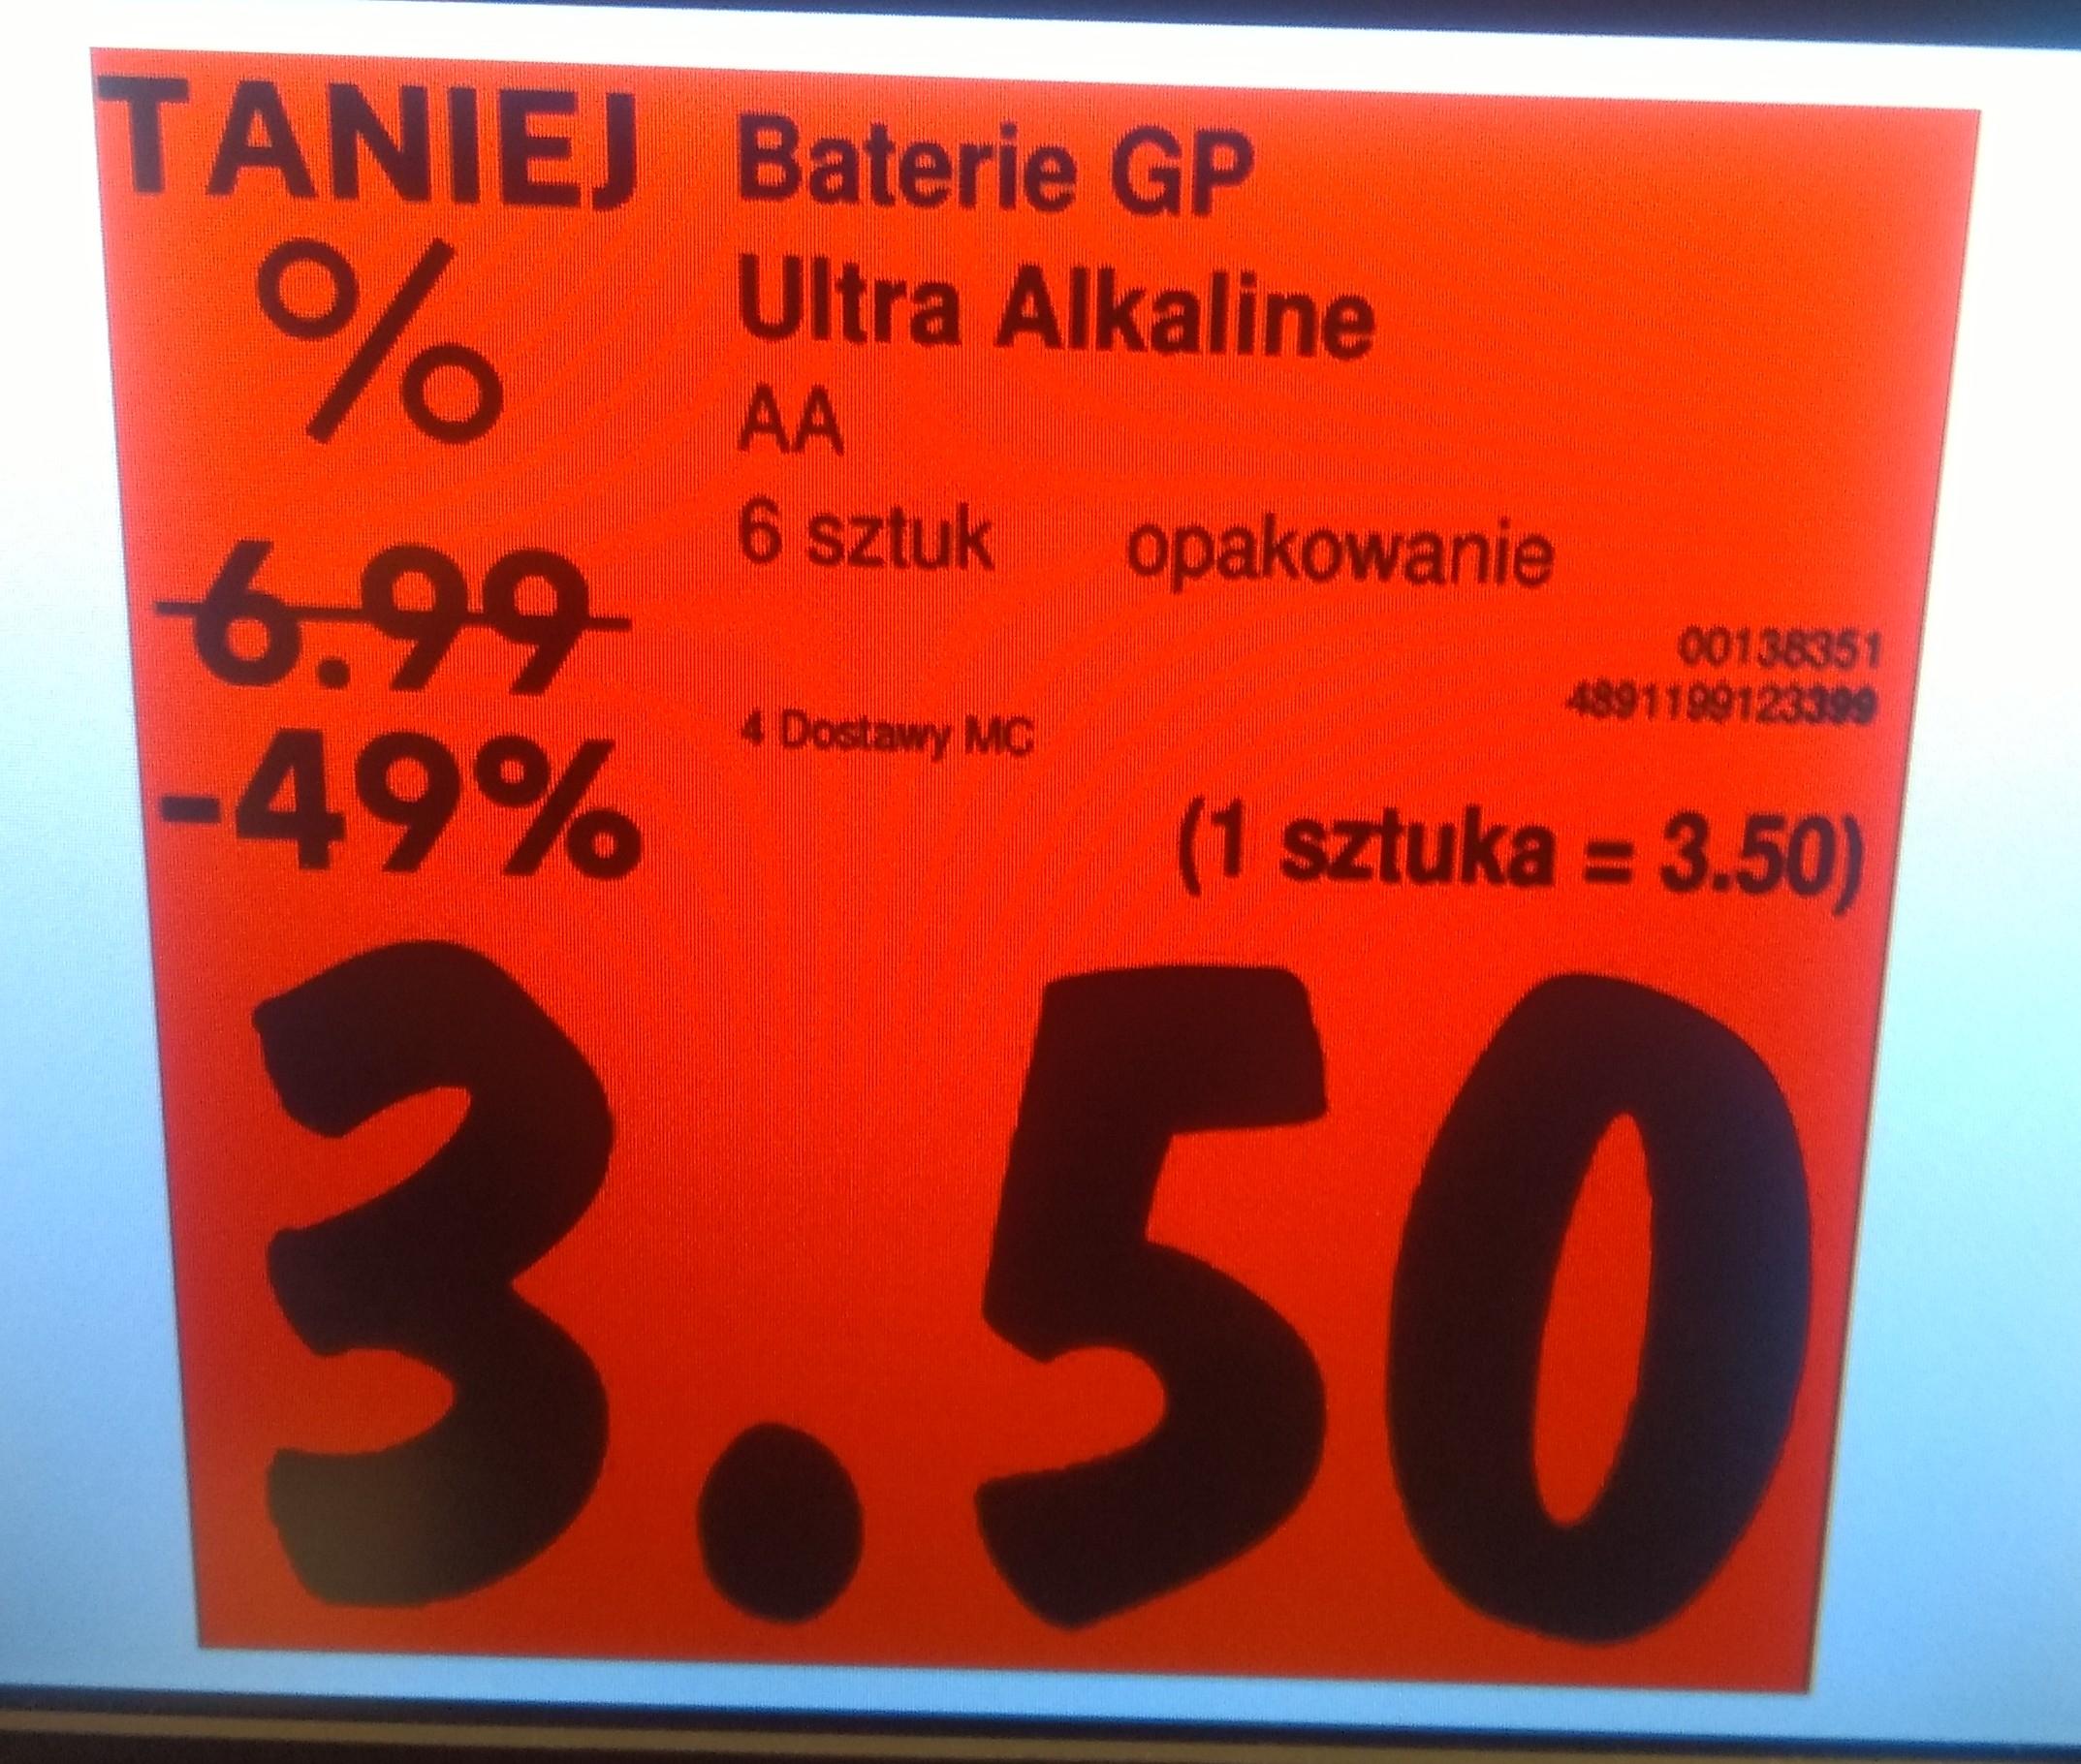 Baterie AA GP Ultra alkaline 6 szt - Kaufland Piastów